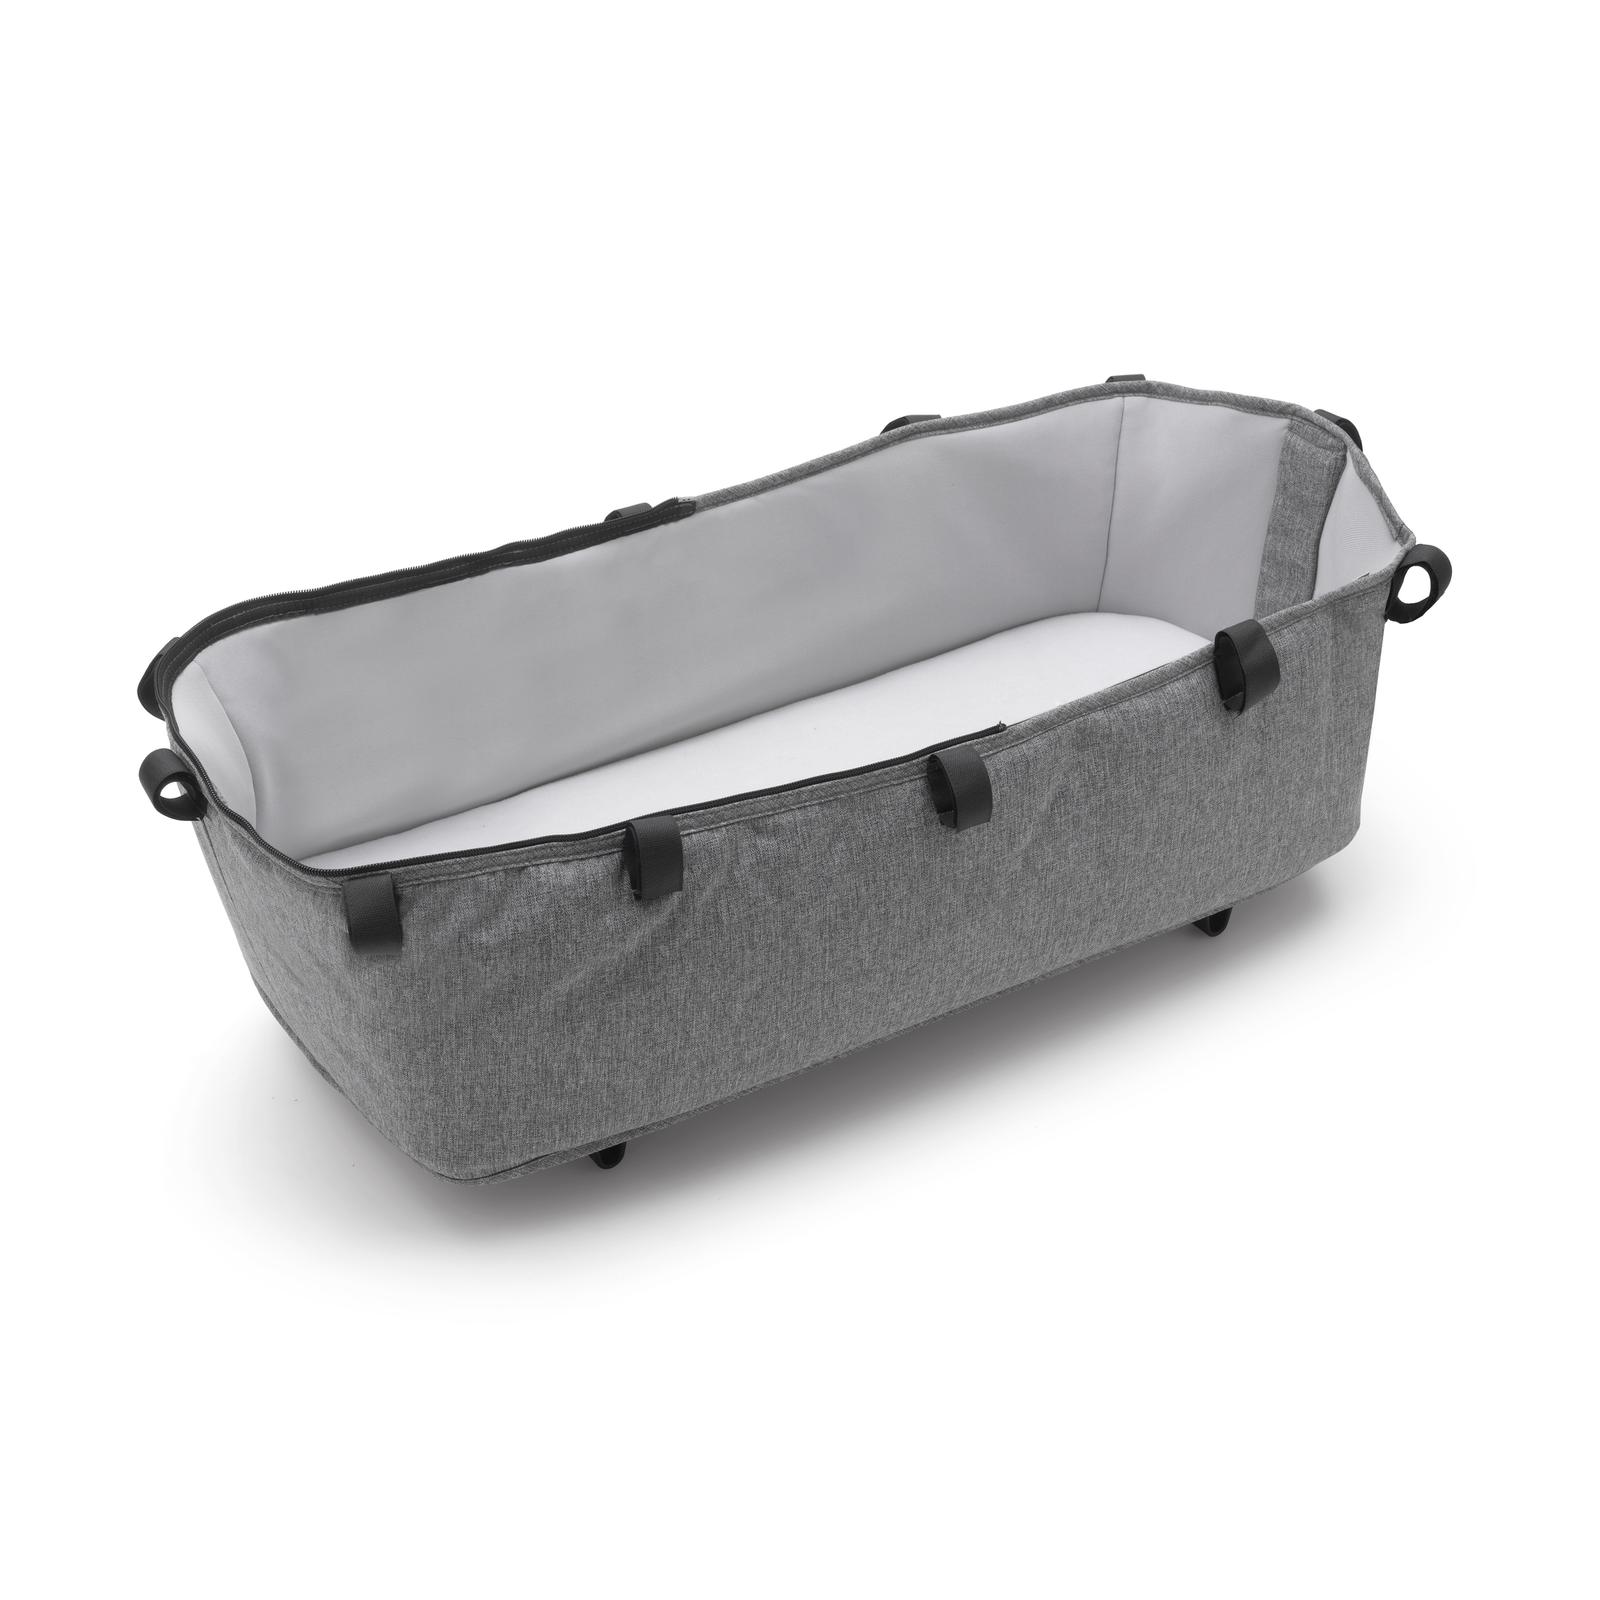 Bugaboo Cameleon 3 Plus bassinet fabric